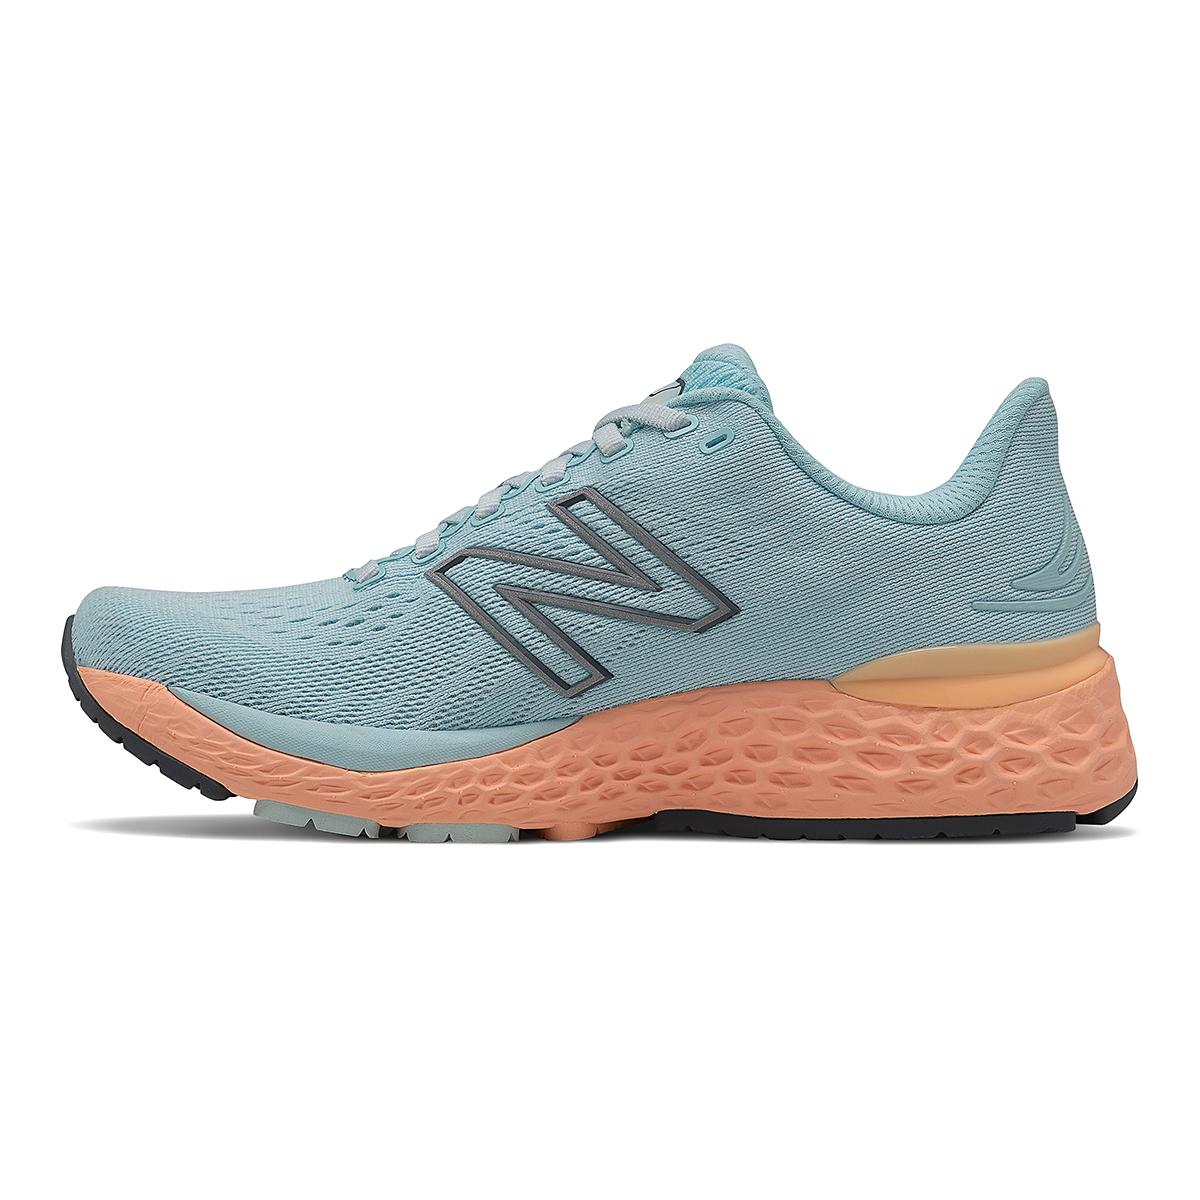 Women's New Balance 880V11 Running Shoe - Color: Pale Blue Chill/Light Mango - Size: 5 - Width: Narrow, Pale Blue Chill/Light Mango, large, image 2